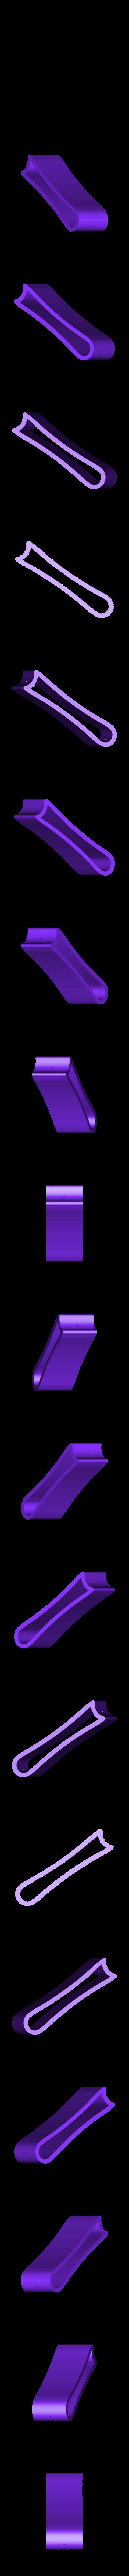 C3_X1.stl Download STL file Adjustable lamp - with vertebrae  • 3D printable object, Ciokobango